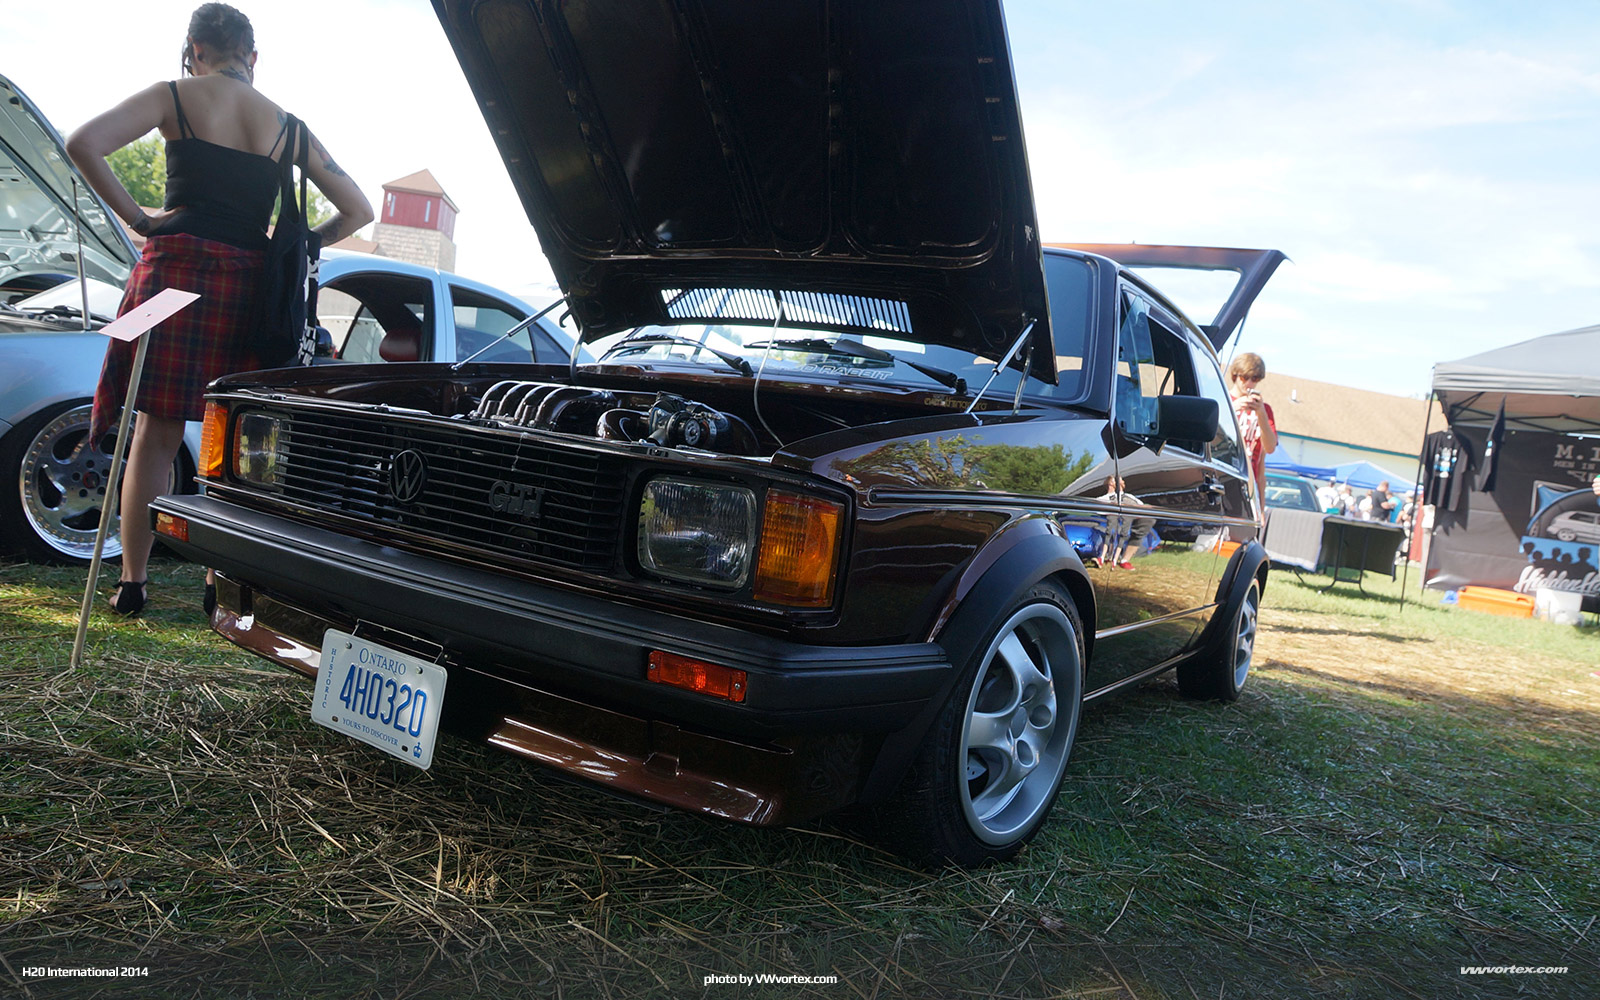 2014-H20i-H20-International-VW-Volkswagen-Audi-479